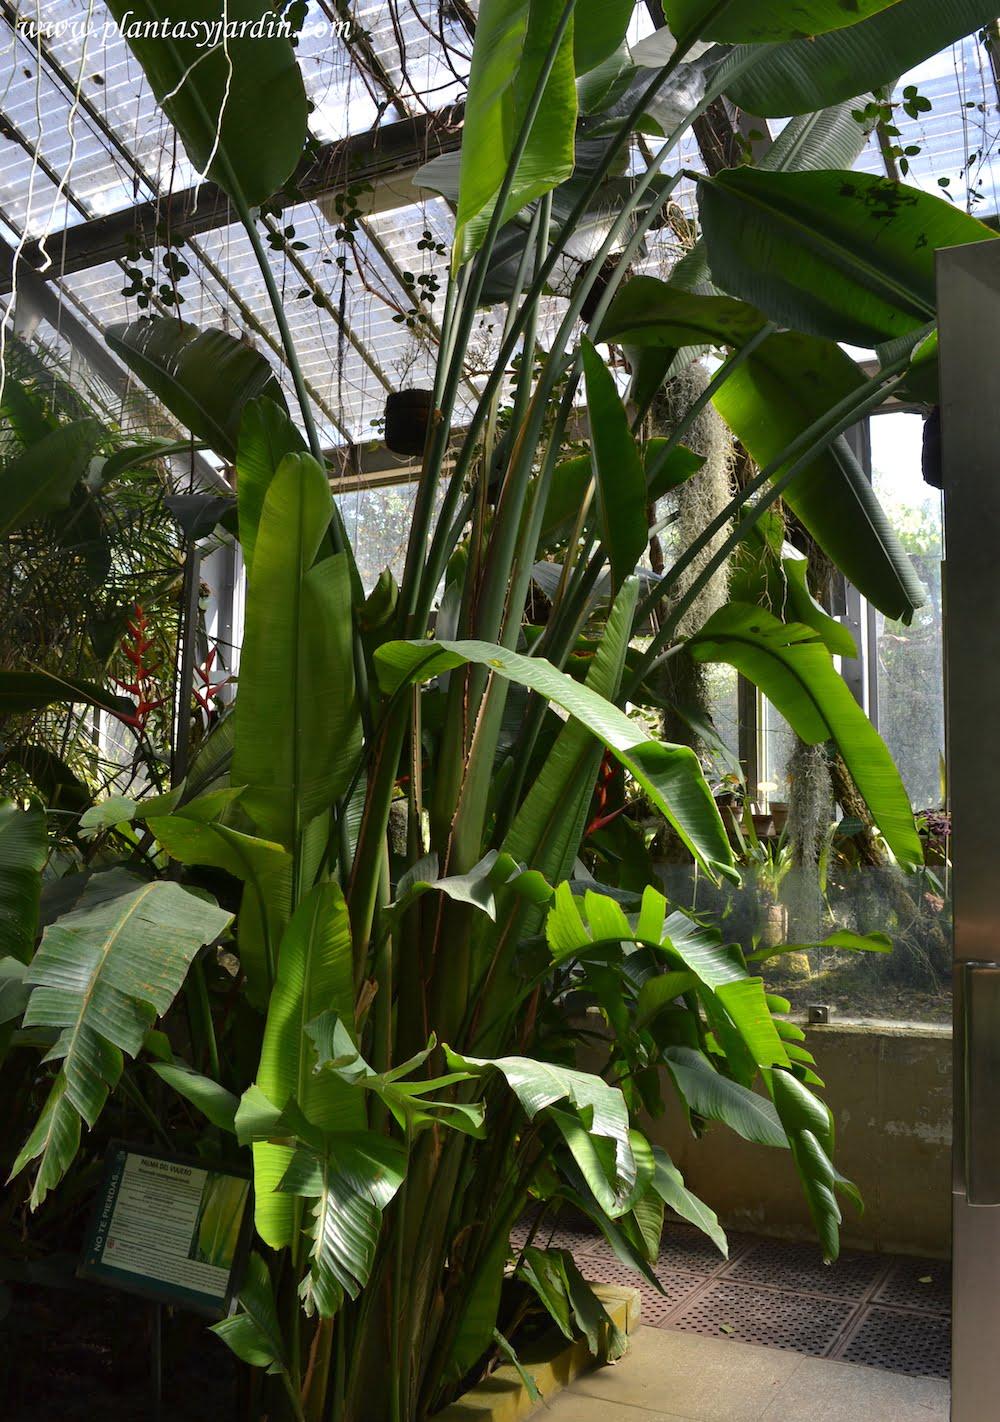 Palma del viajero cultivada dentro del invernadero